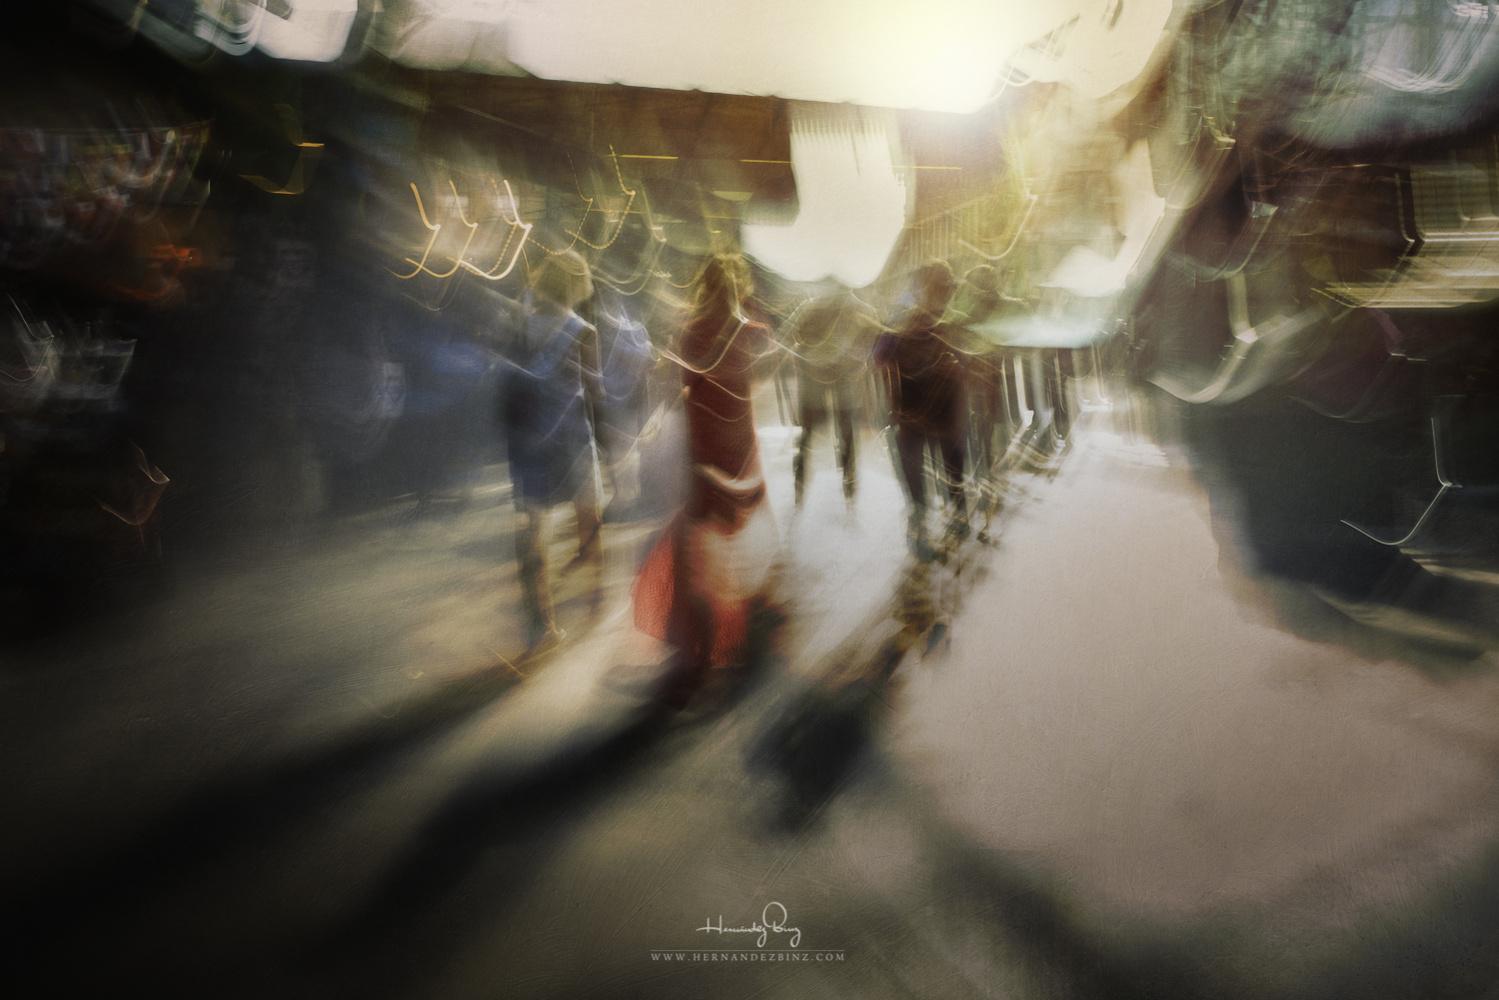 Untitled 6 by Adrian Hernandez Binz